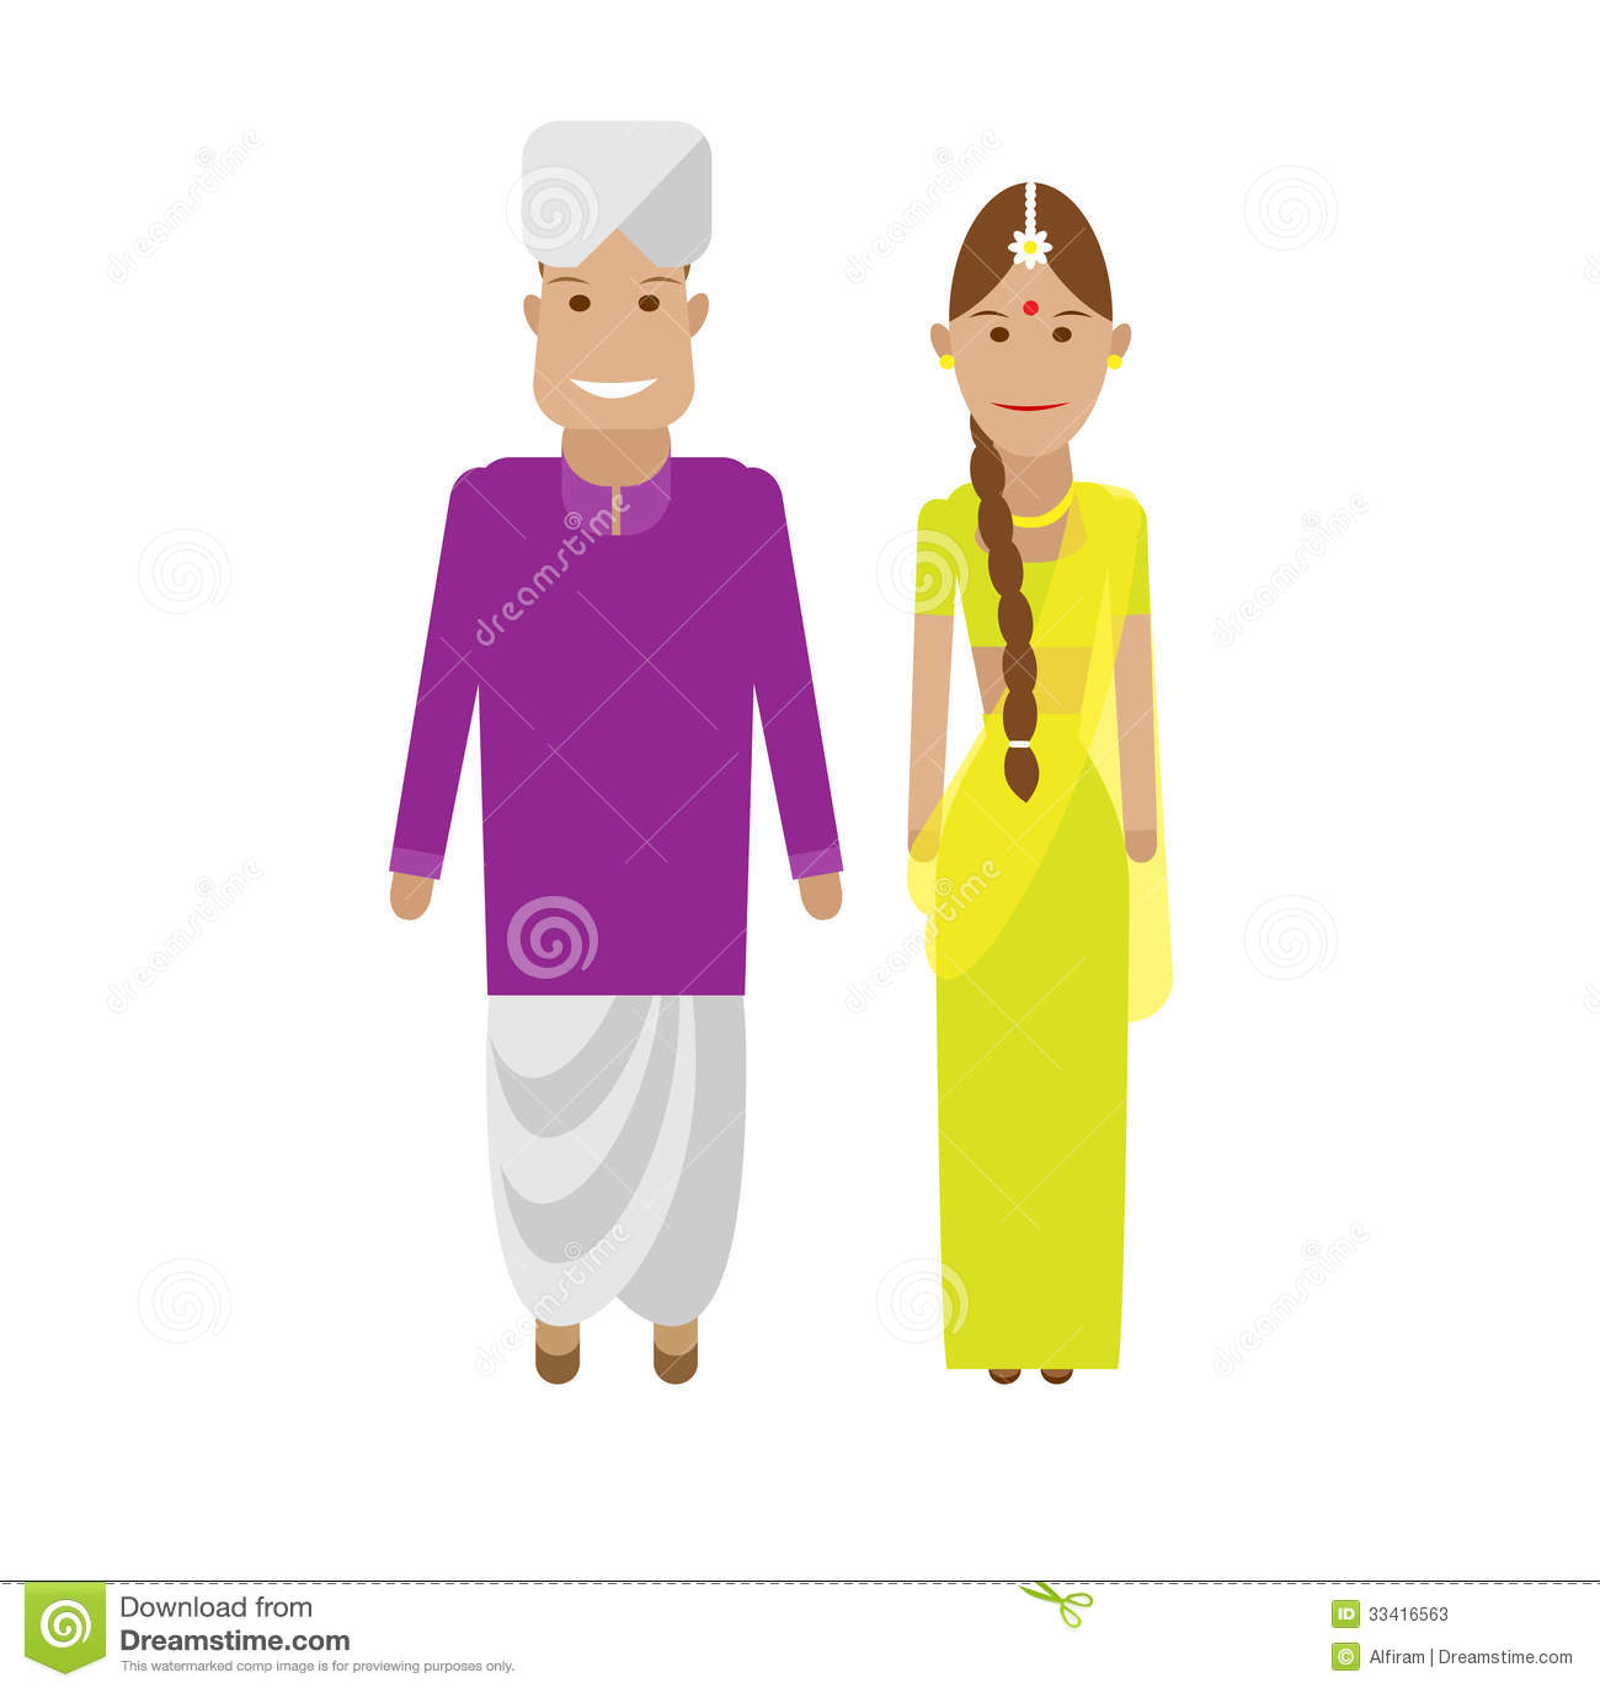 Indian national dress